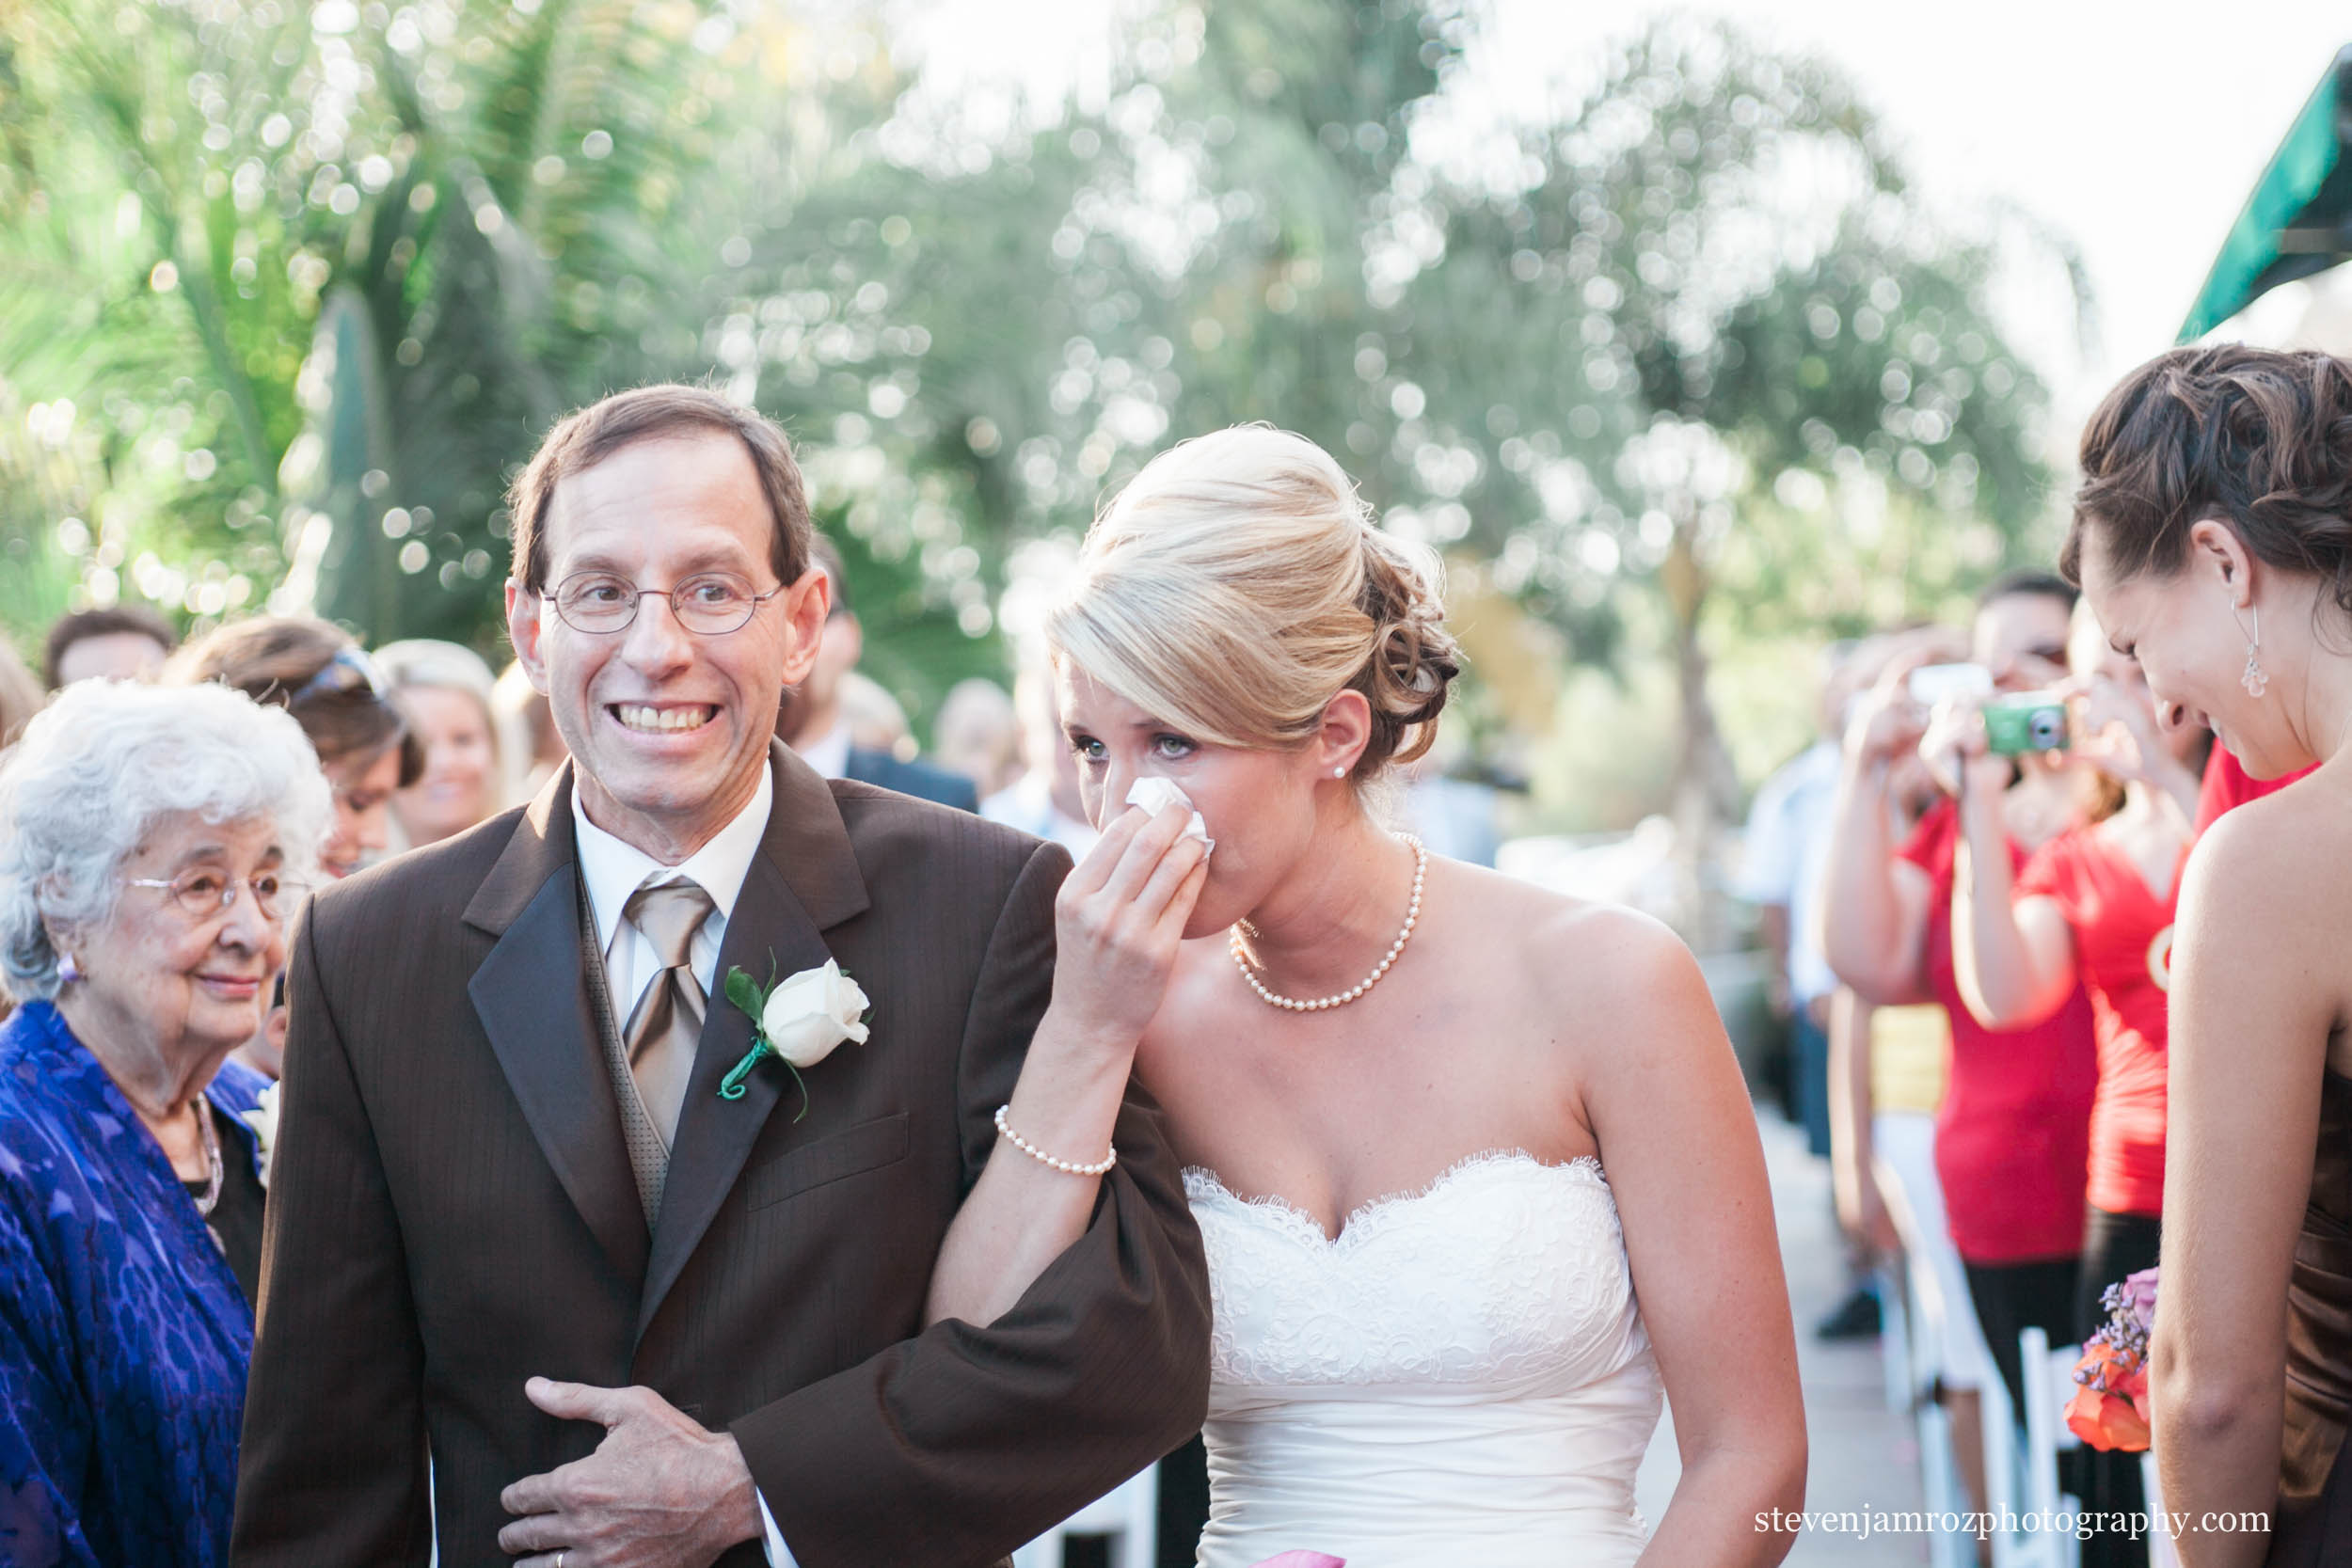 proud-father-wedding-photographer-steven-jamroz-photography-0006.jpg